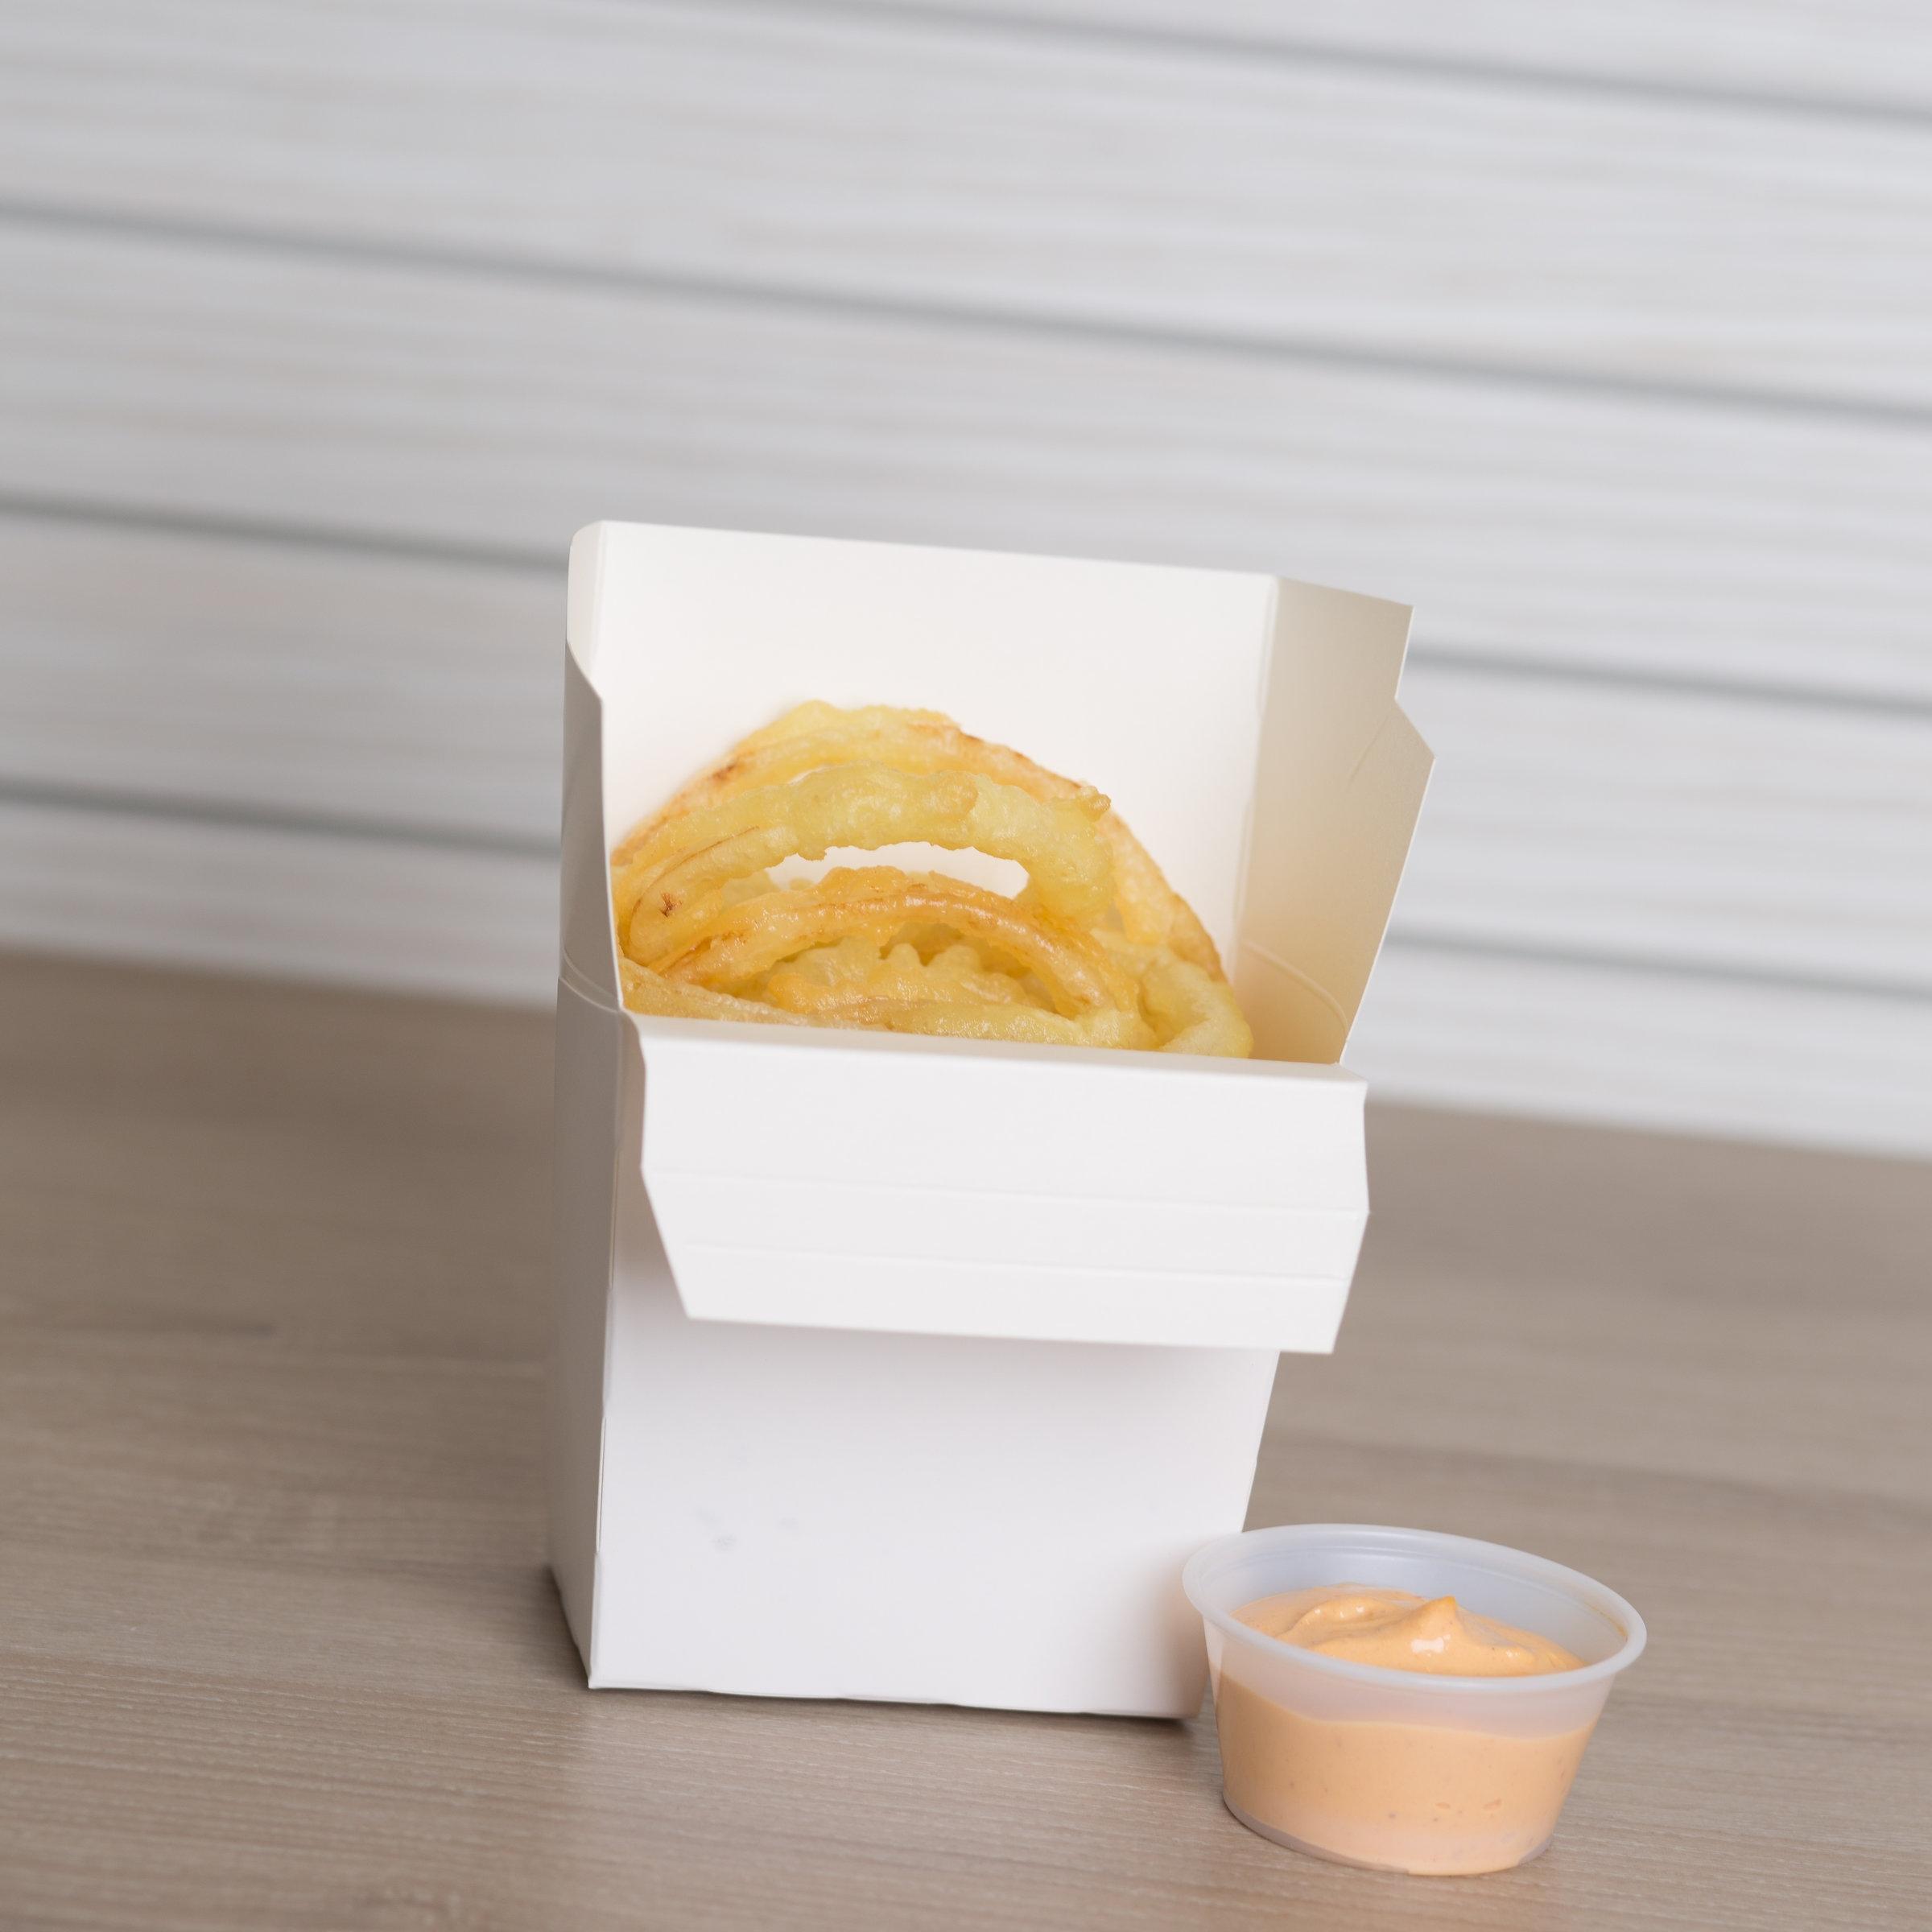 Onion rings vegan - Parka Food Co.jpg